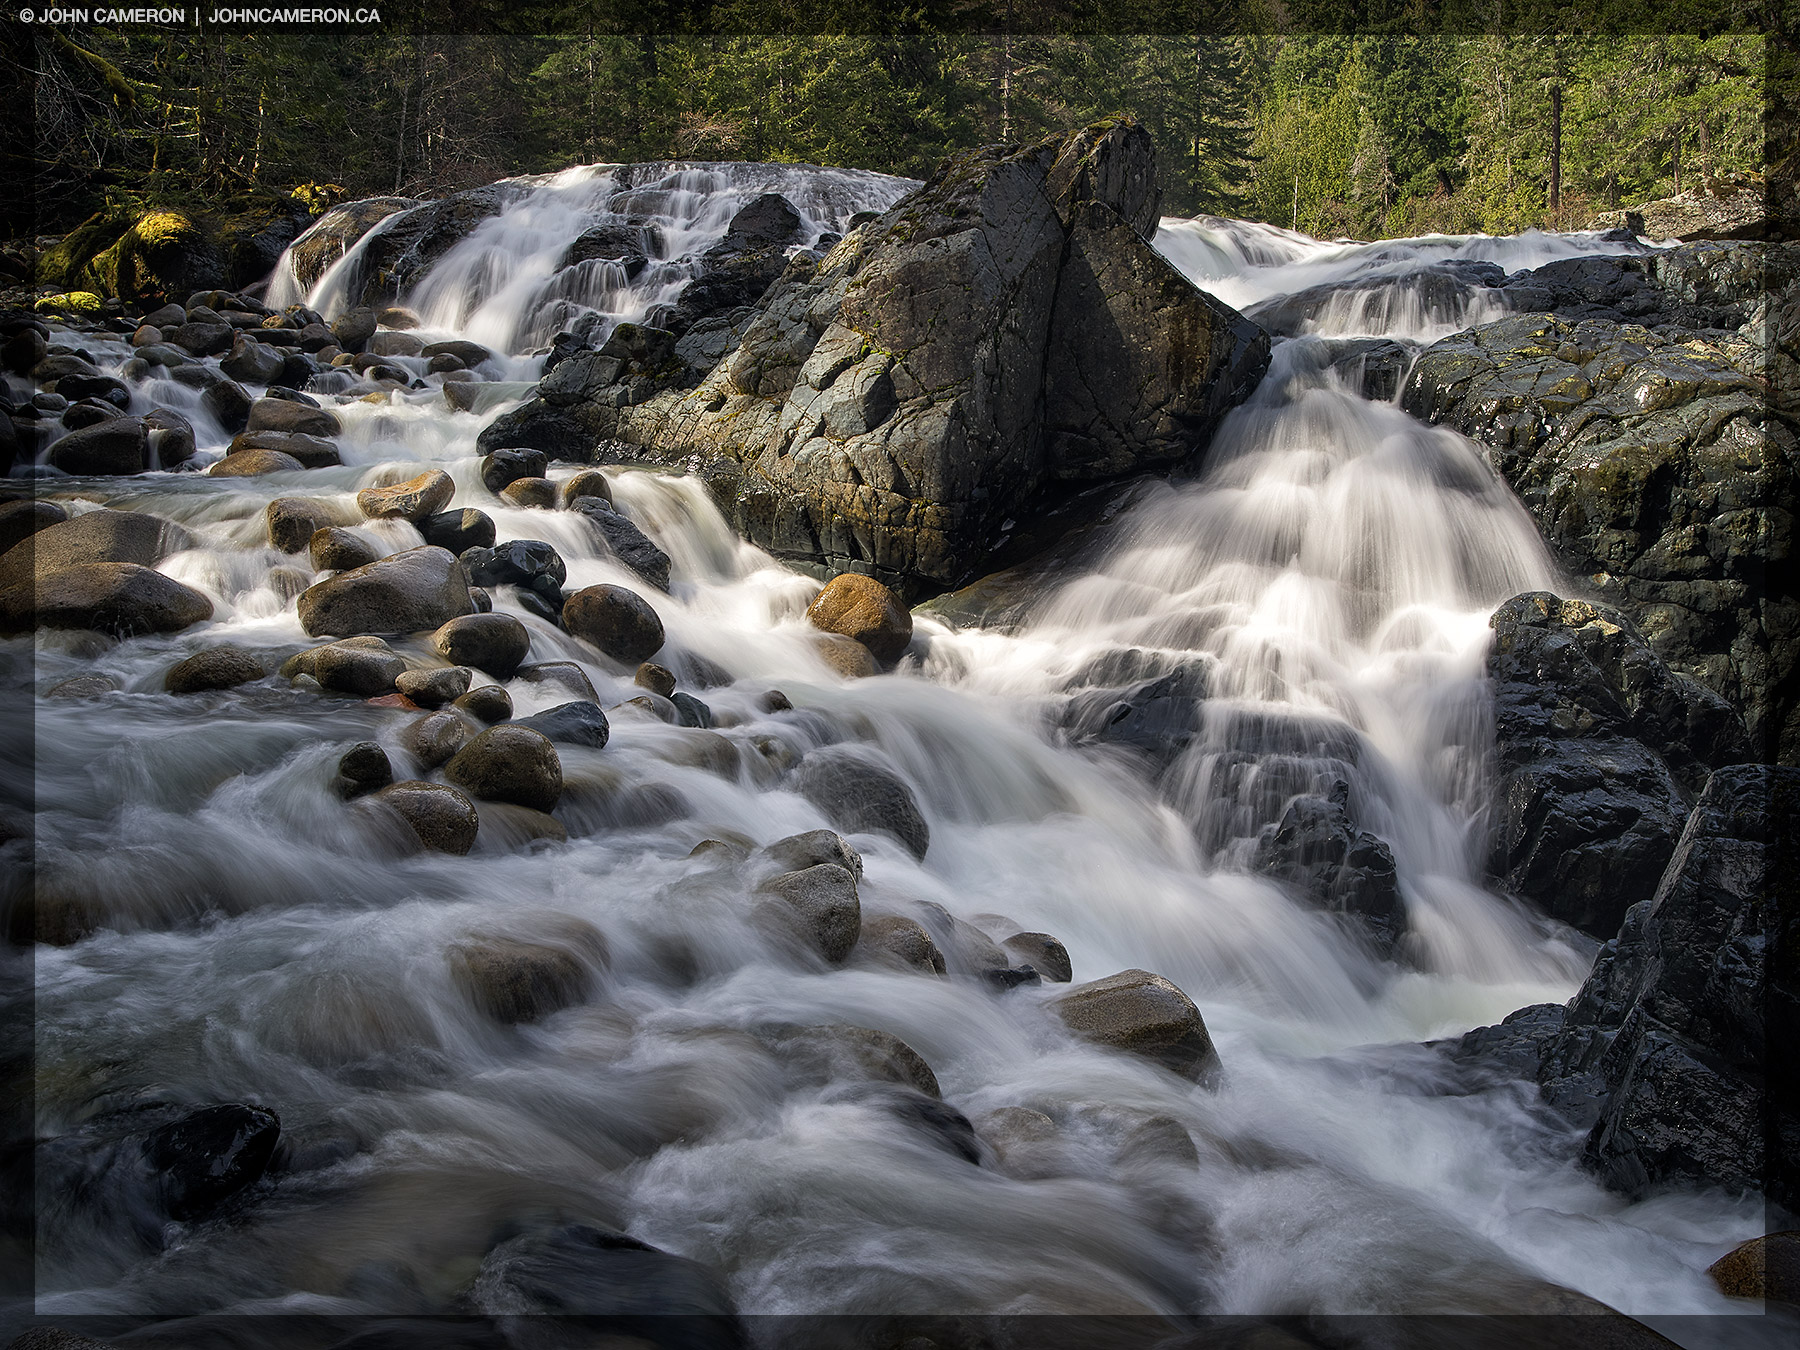 Near the Falls